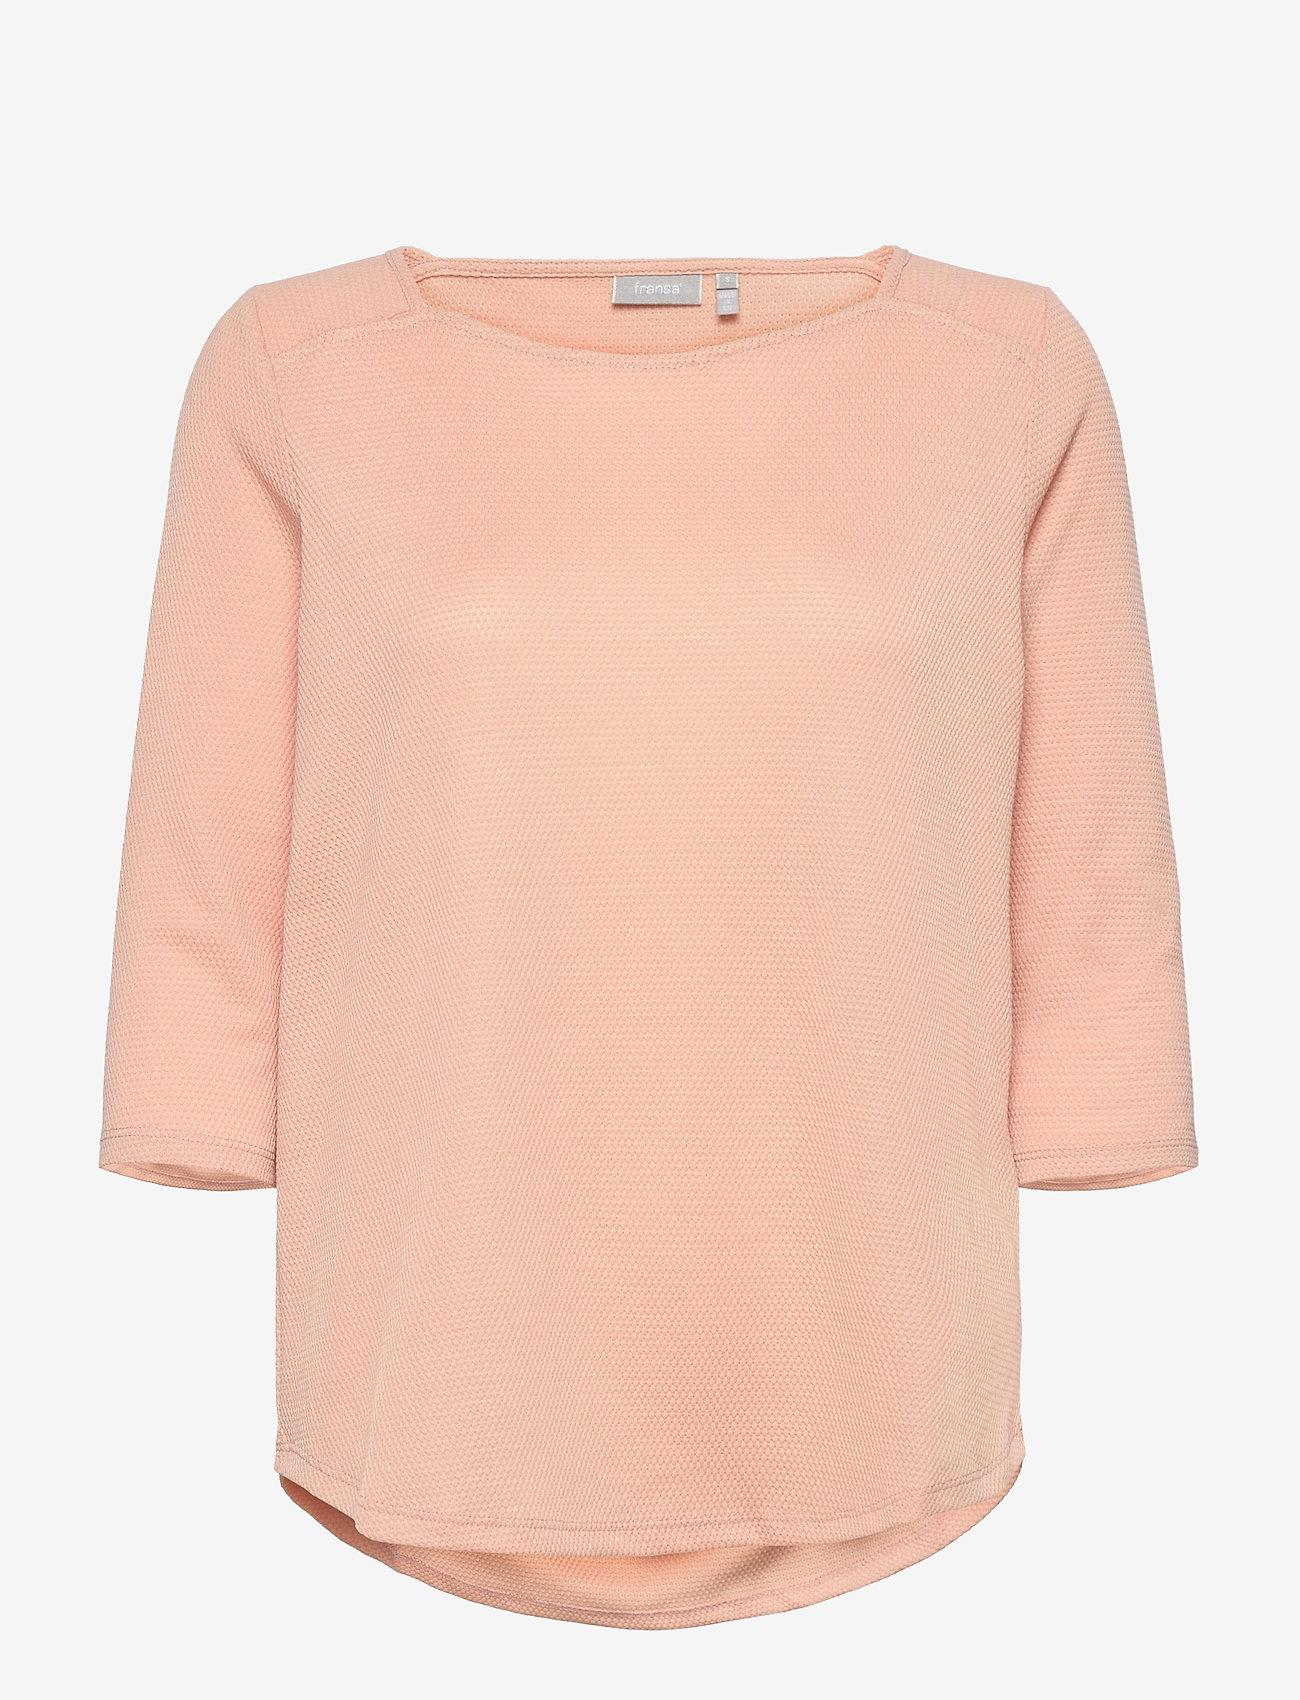 Fransa - FRPEJACQ 1 T-shirt - pitkähihaiset t-paidat - misty rose - 0